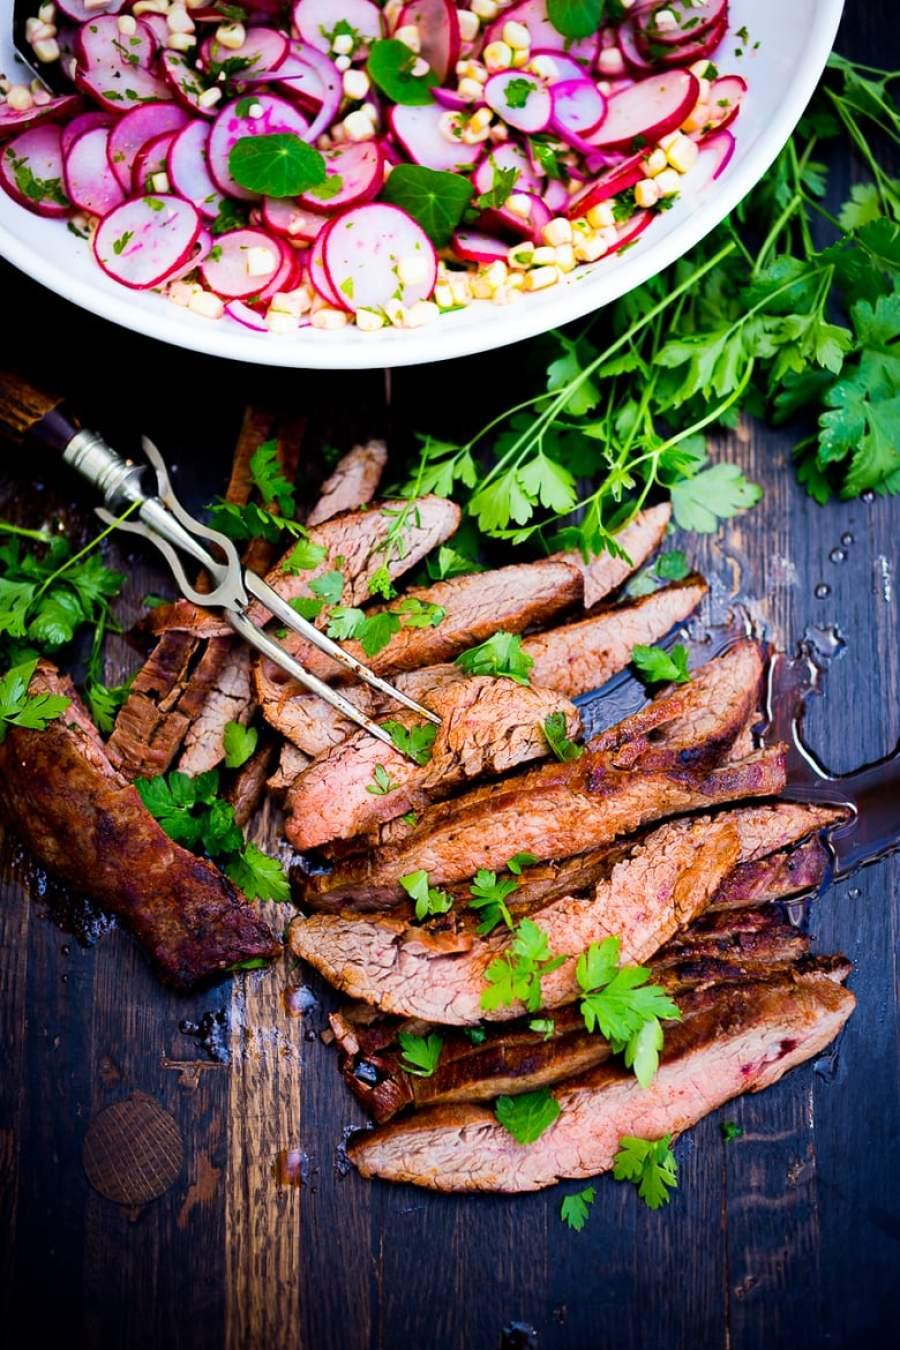 Grilled Flank Steak with Sweet Corn & Radish Salad